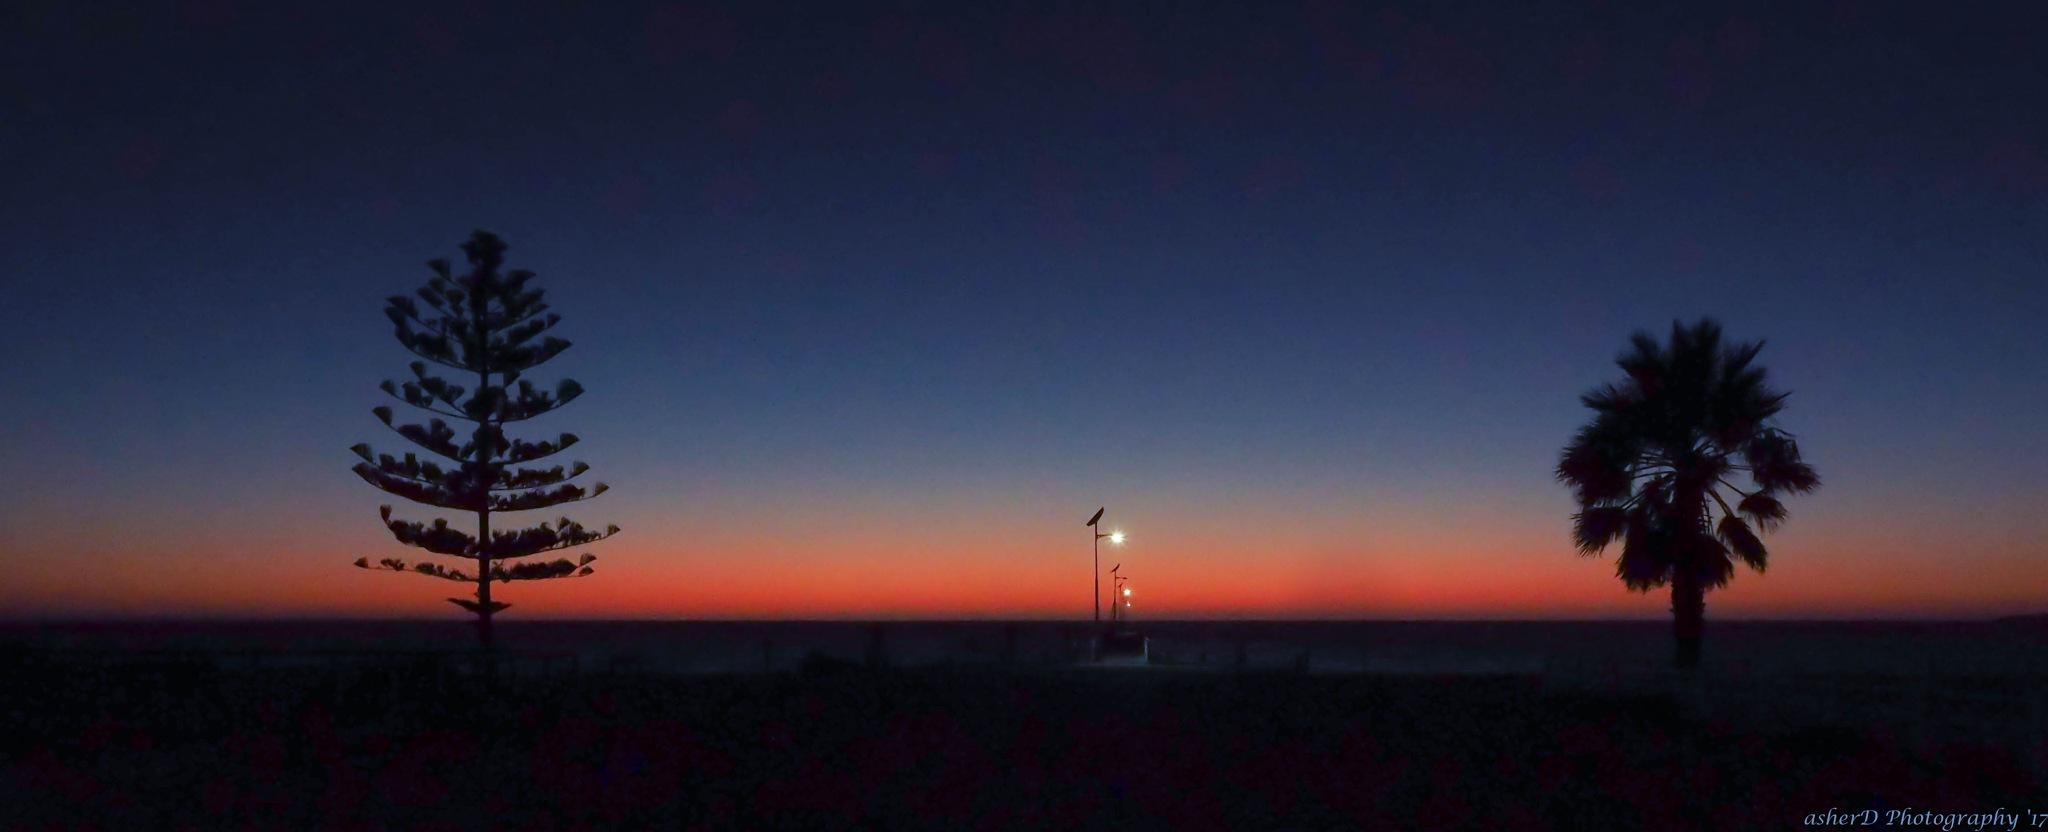 Toward daylight by Ashley Downing